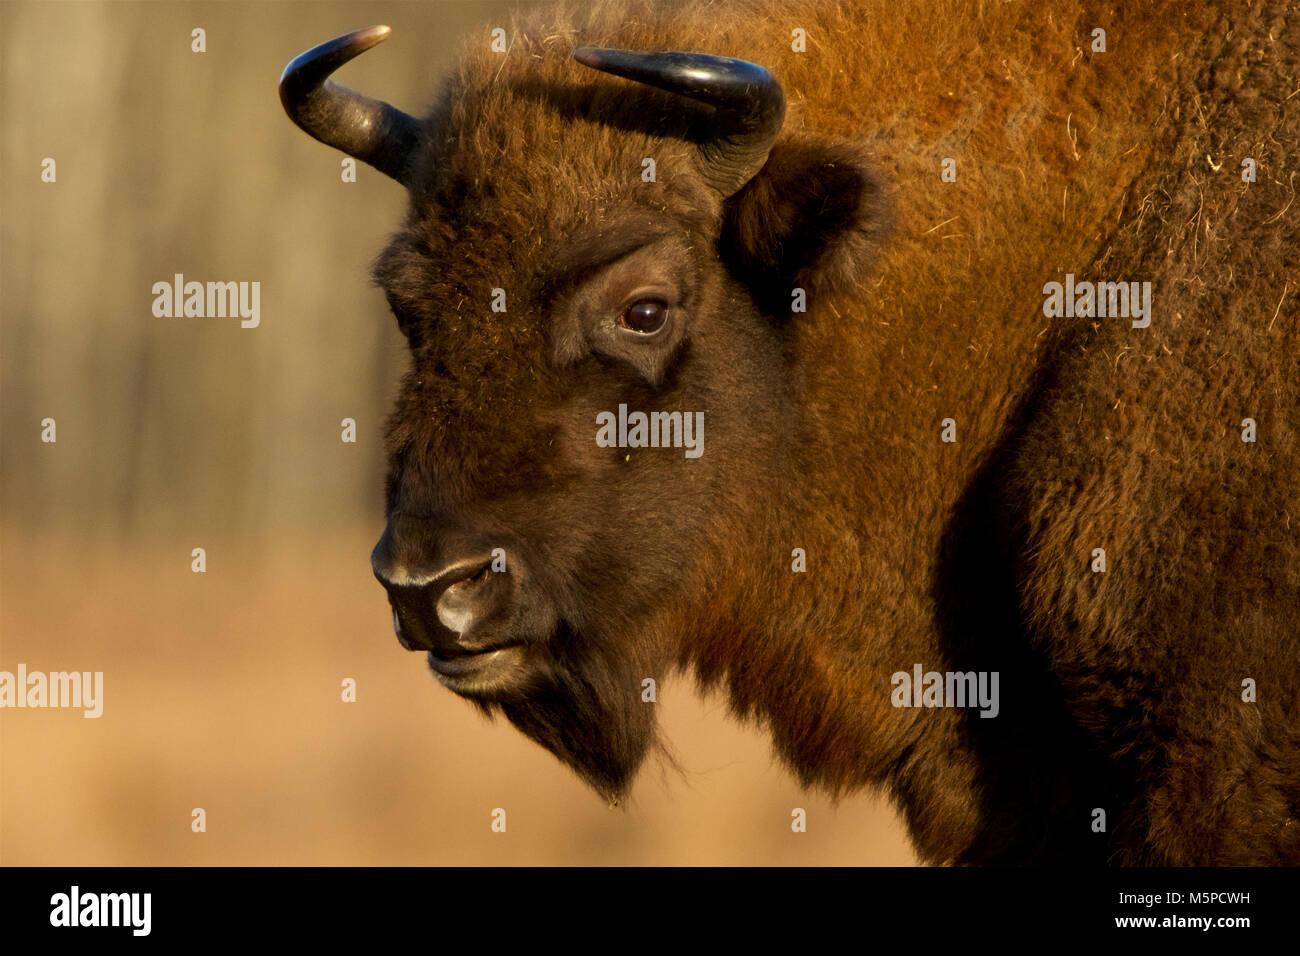 Closeup portrait of a full-grown European Bison in Bialowieza, in Poland. Stock Photo